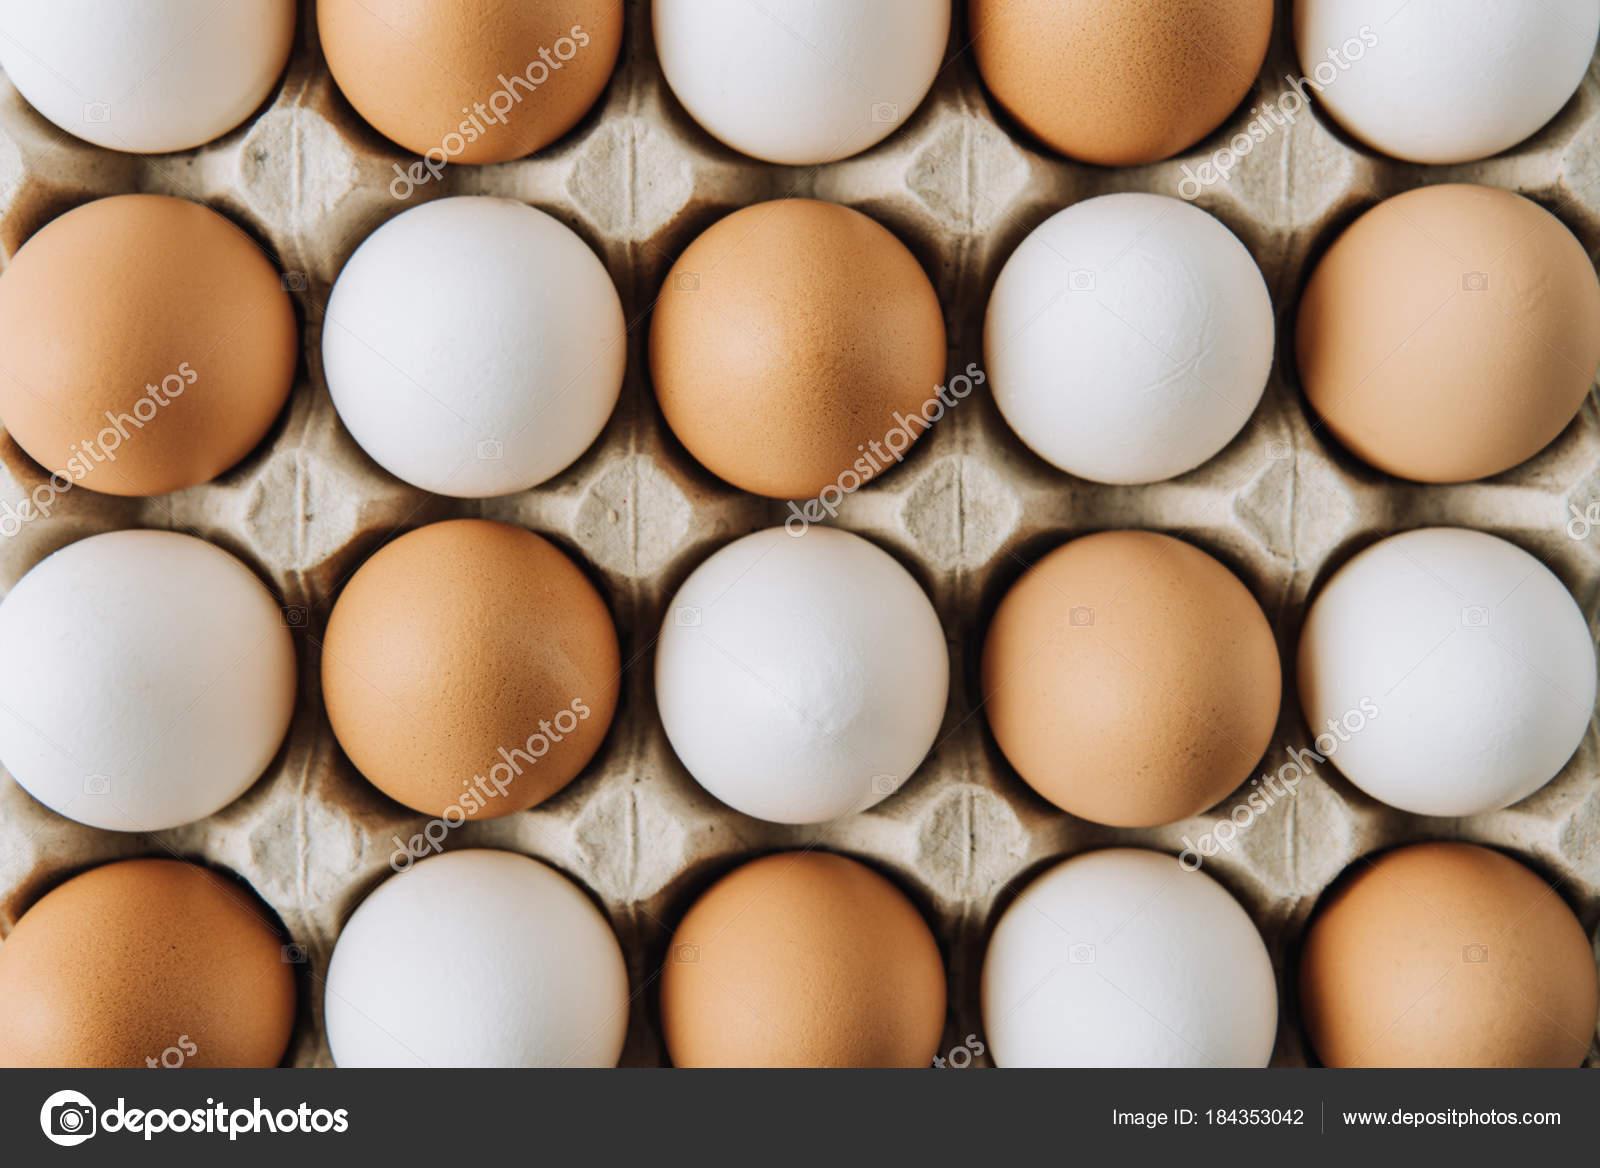 White Brown Eggs Laying Egg Carton Full